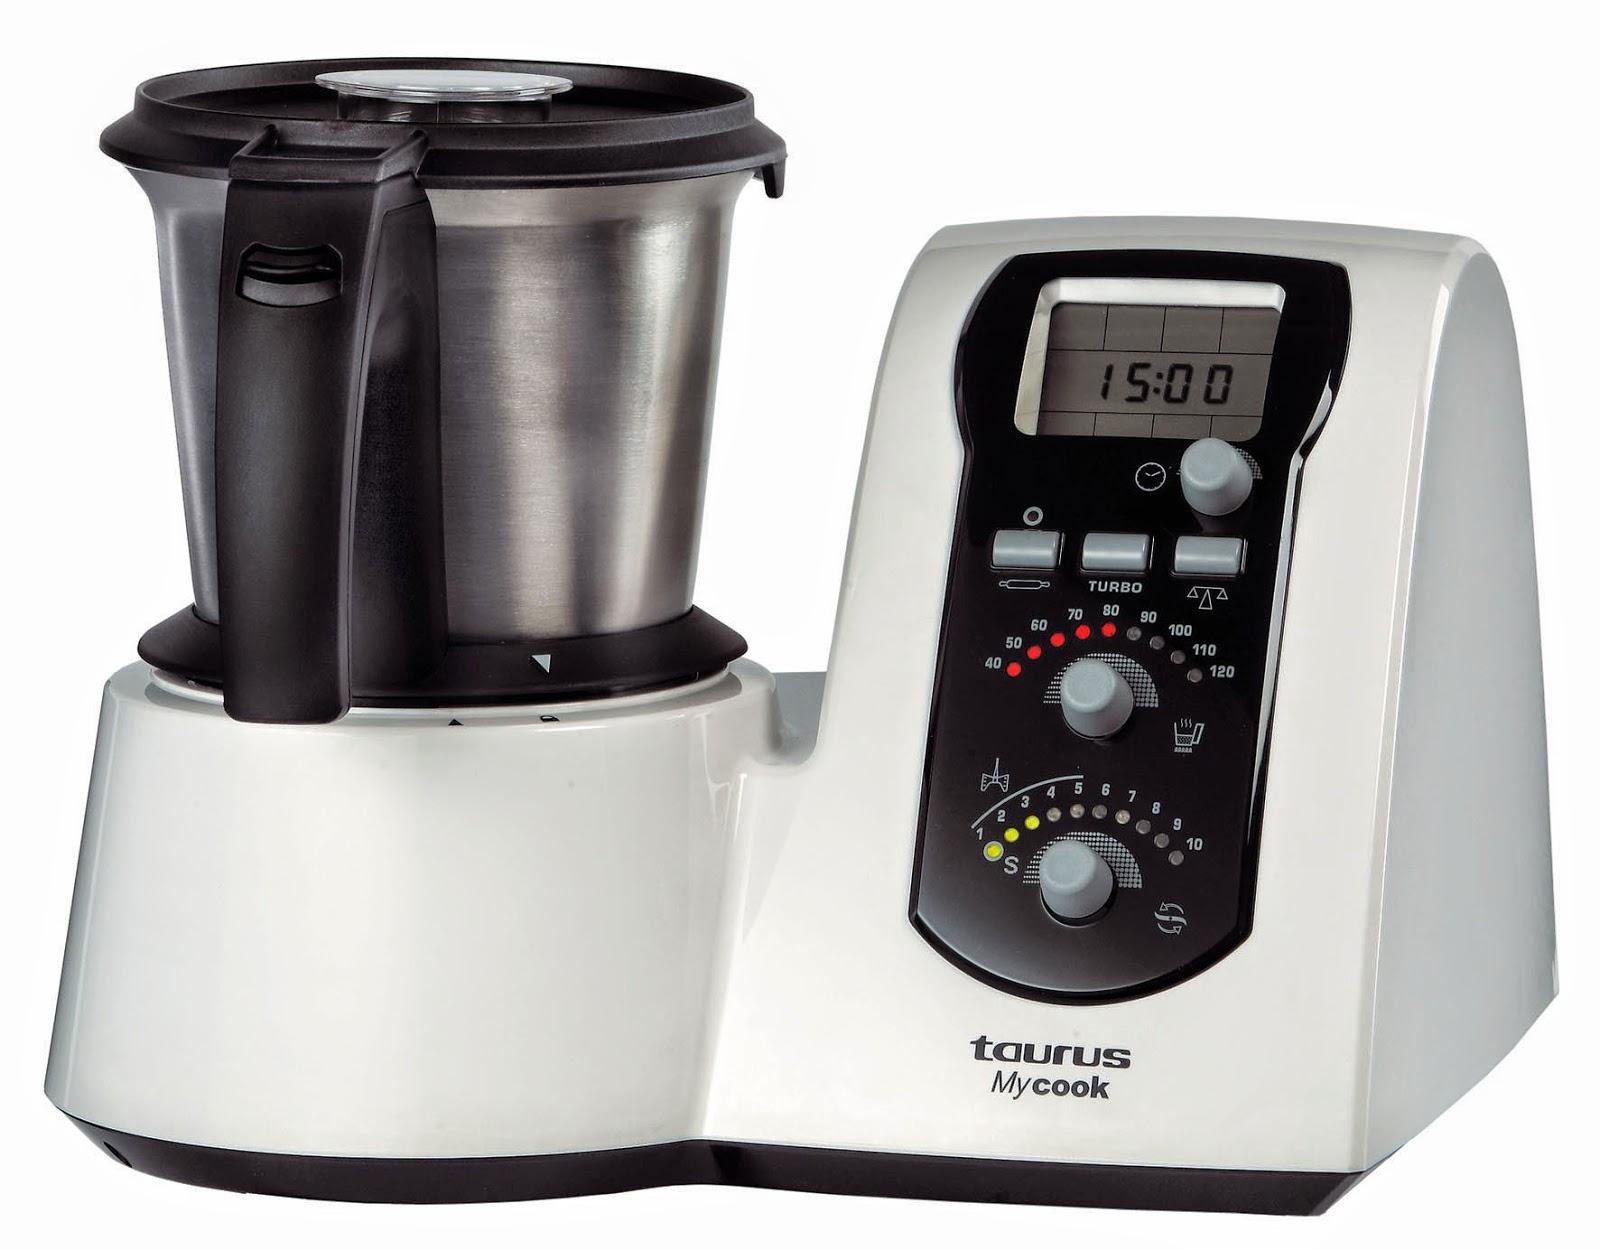 bonito robot de cocina similar a thermomix fotos robot de cocina taurus mycook la thermomix. Black Bedroom Furniture Sets. Home Design Ideas